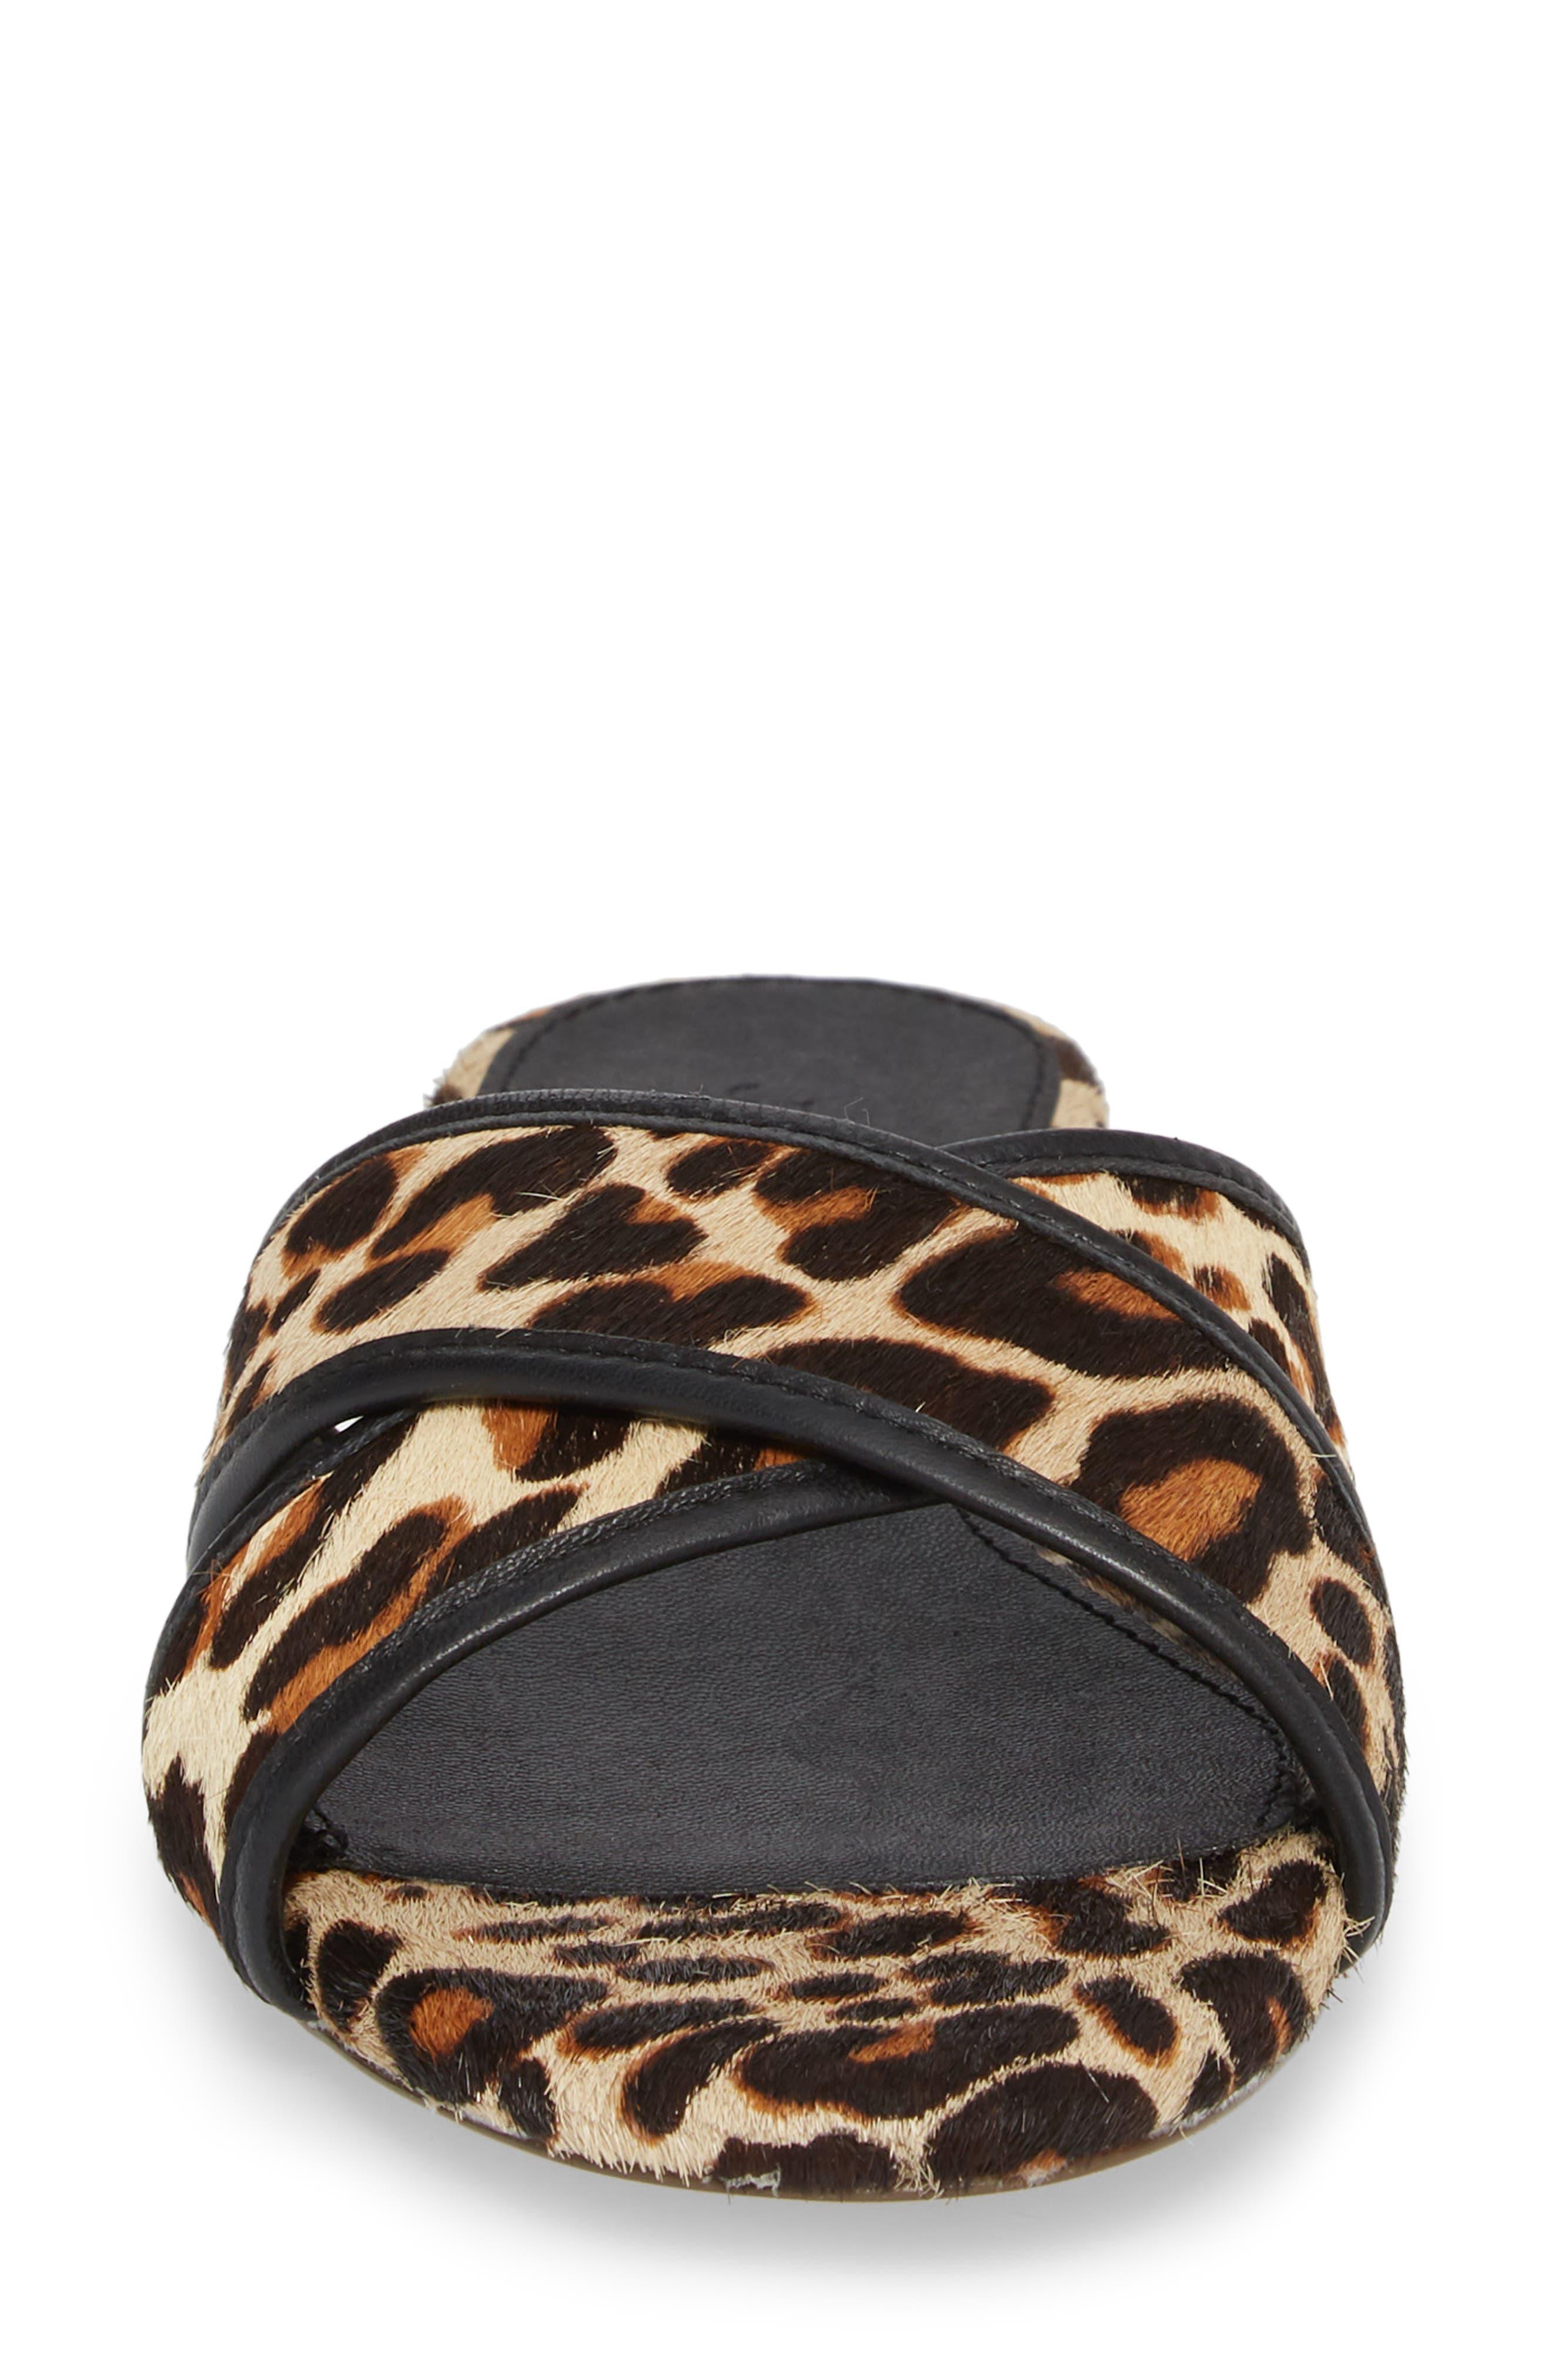 Cora Genuine Calf Hair Slide Sandal,                             Alternate thumbnail 5, color,                             Chocolate Sepia